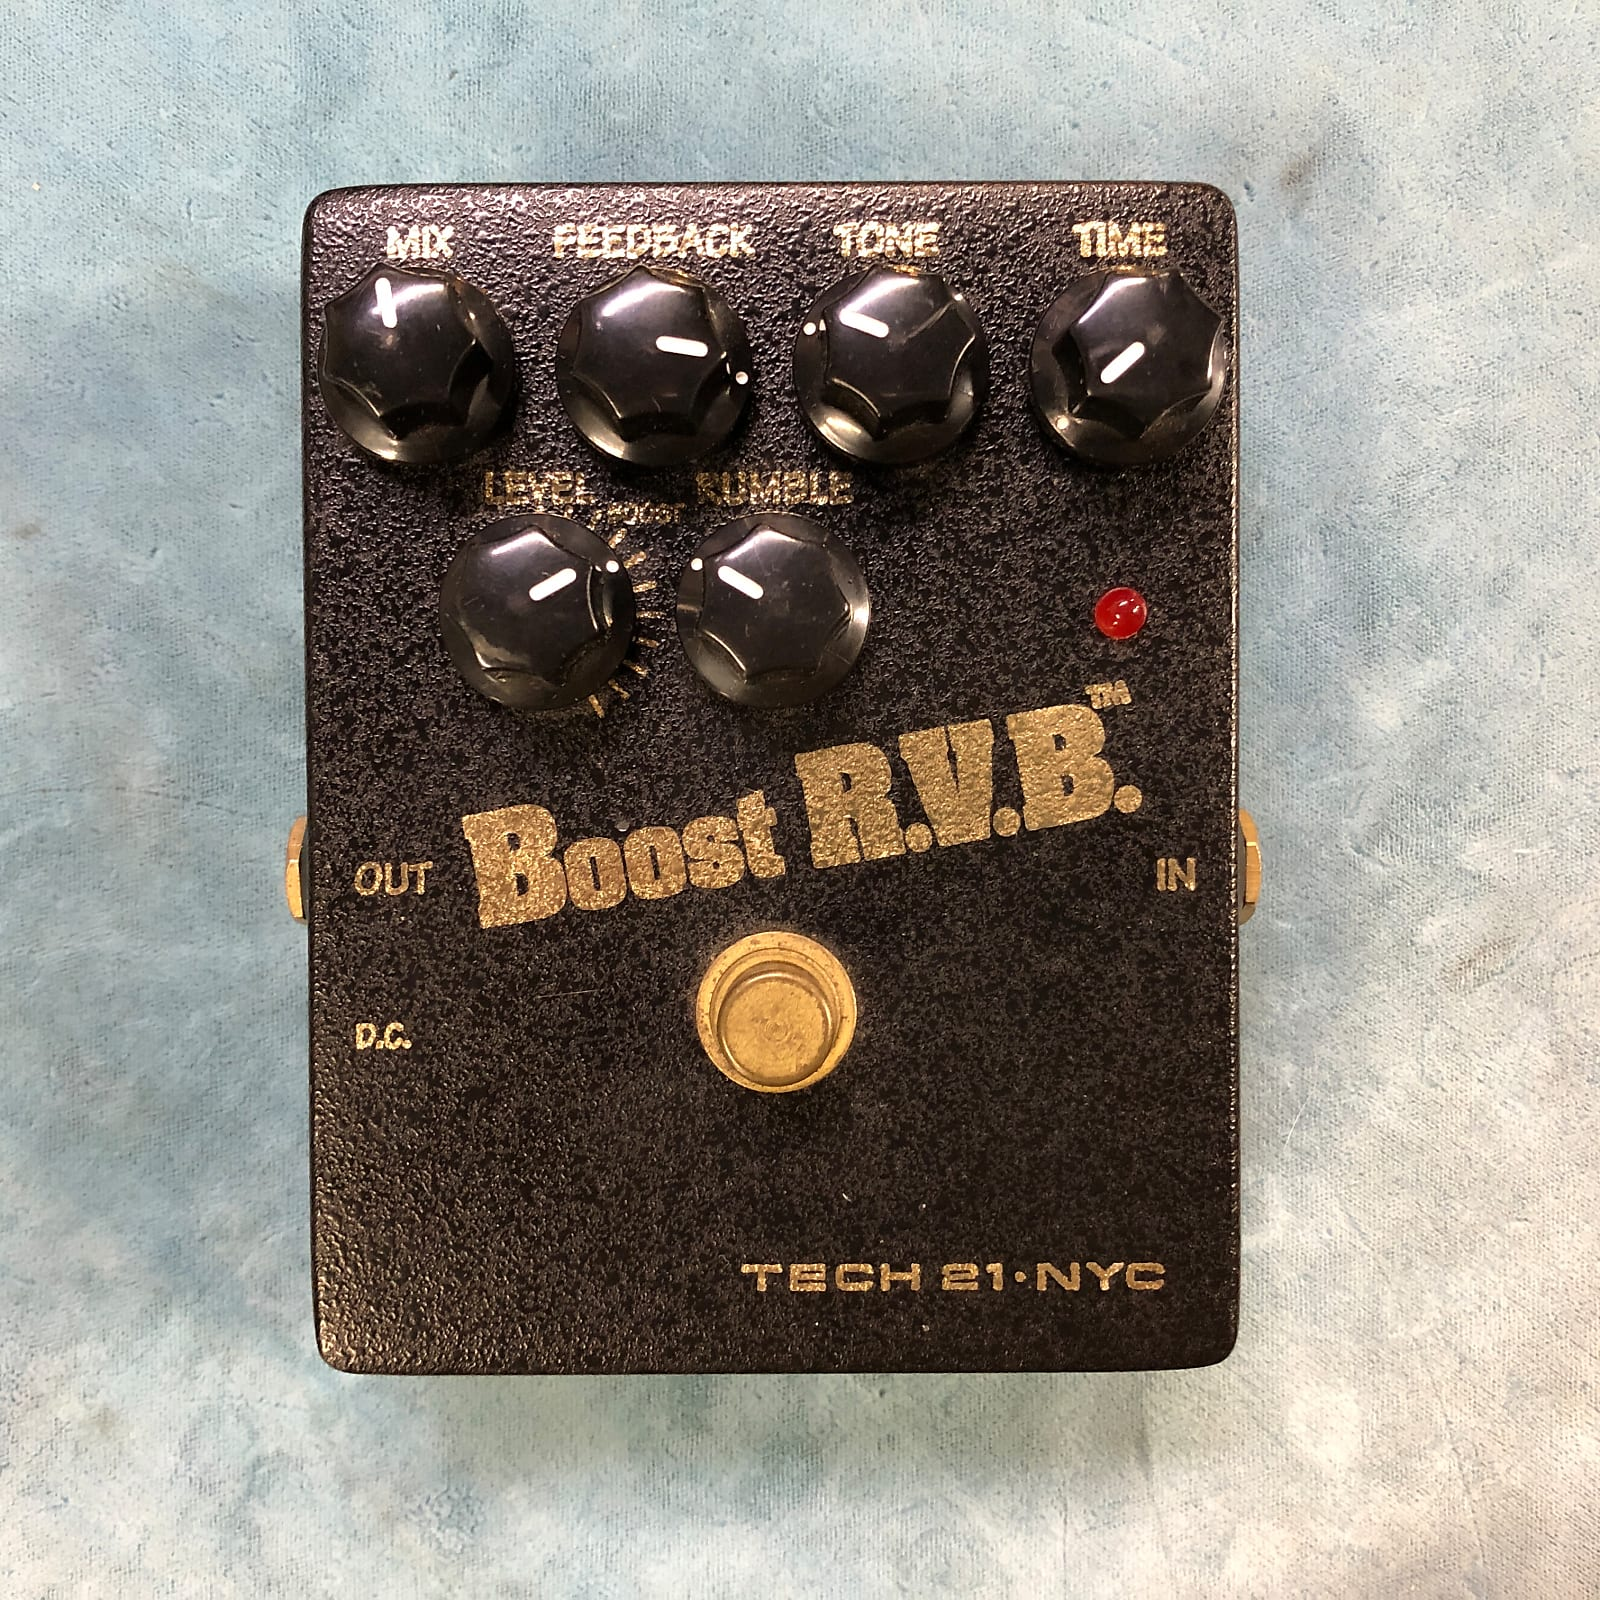 Tech 21 Boost R.V.B. Booster Analog Reverb Emulator / Clean Boost RVB w/ Tin Box